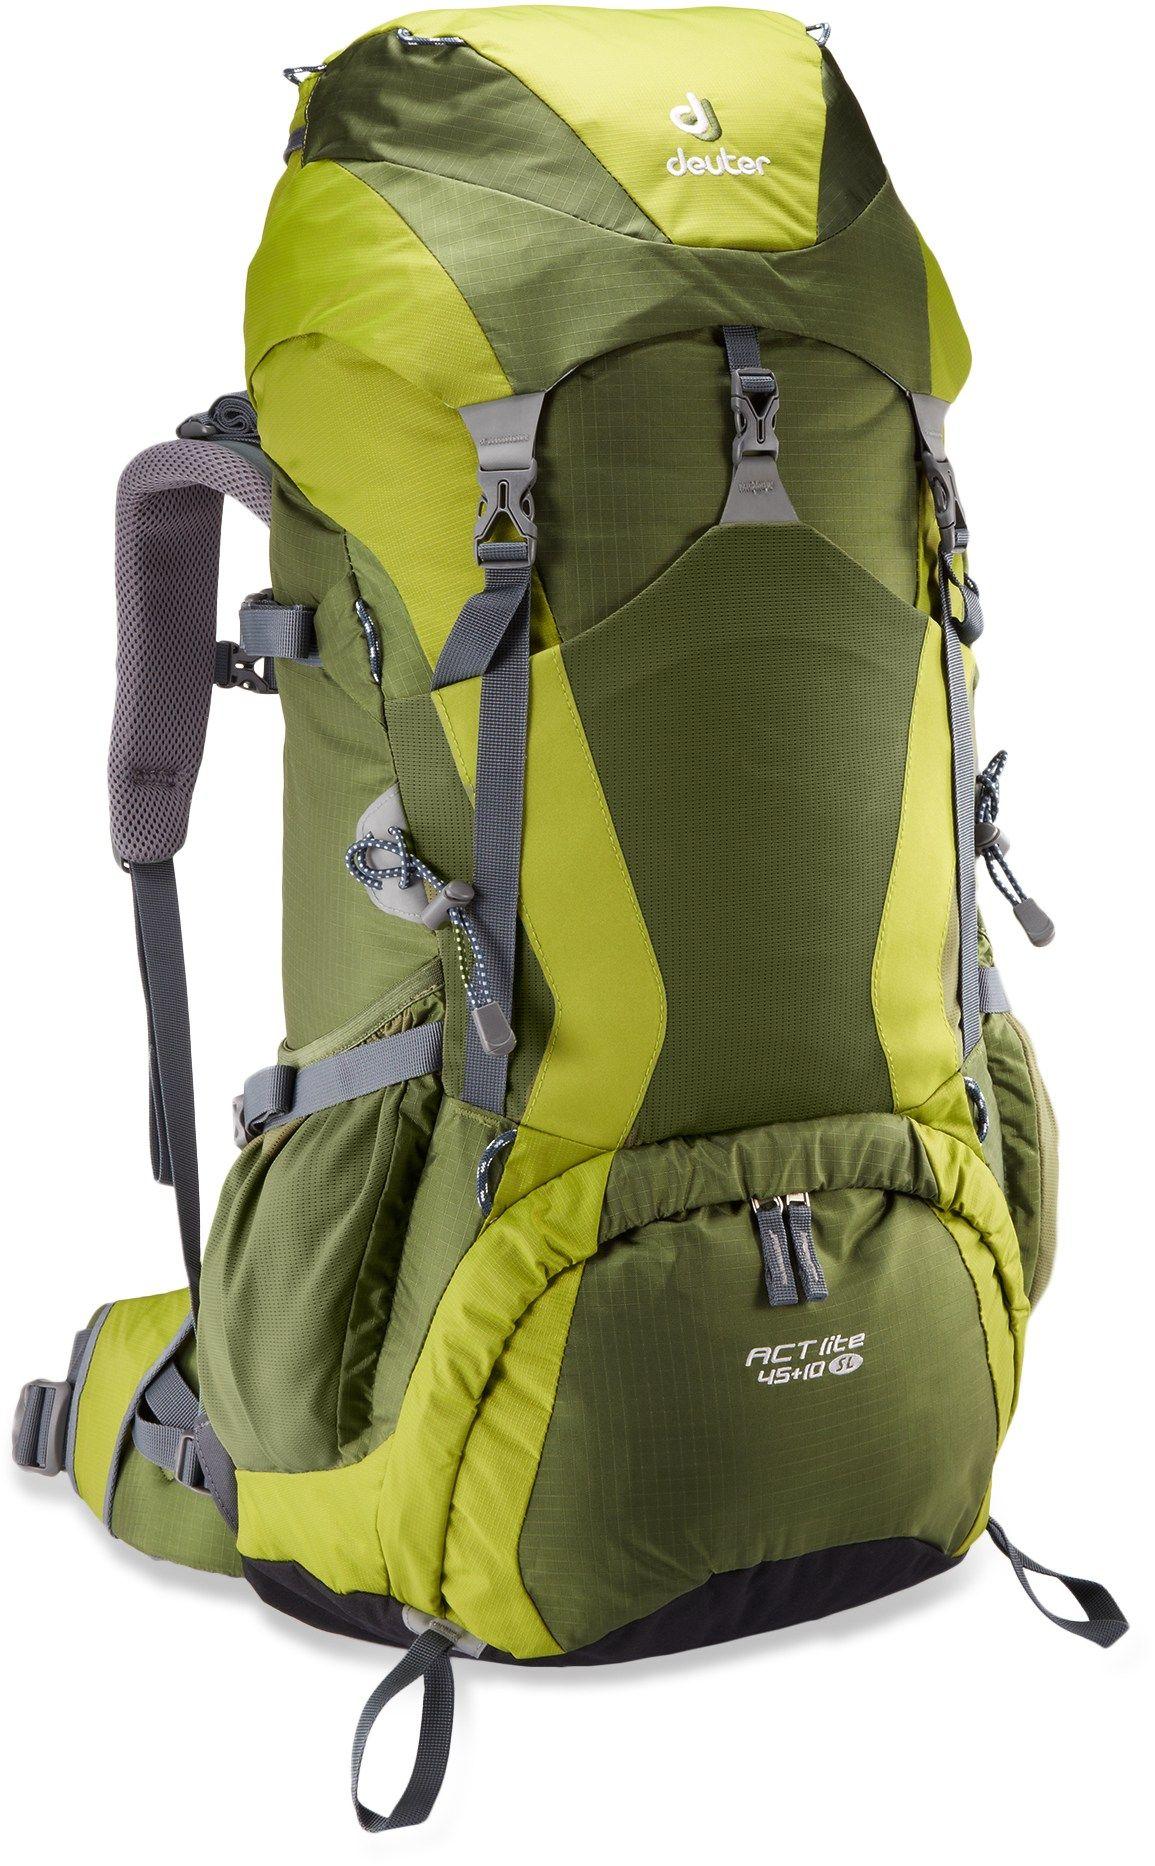 Deuter Act Lite 45 10 Sl Pack Women S Rei Co Op Hiking Backpack Camping Equipment Rental Backpack Brands